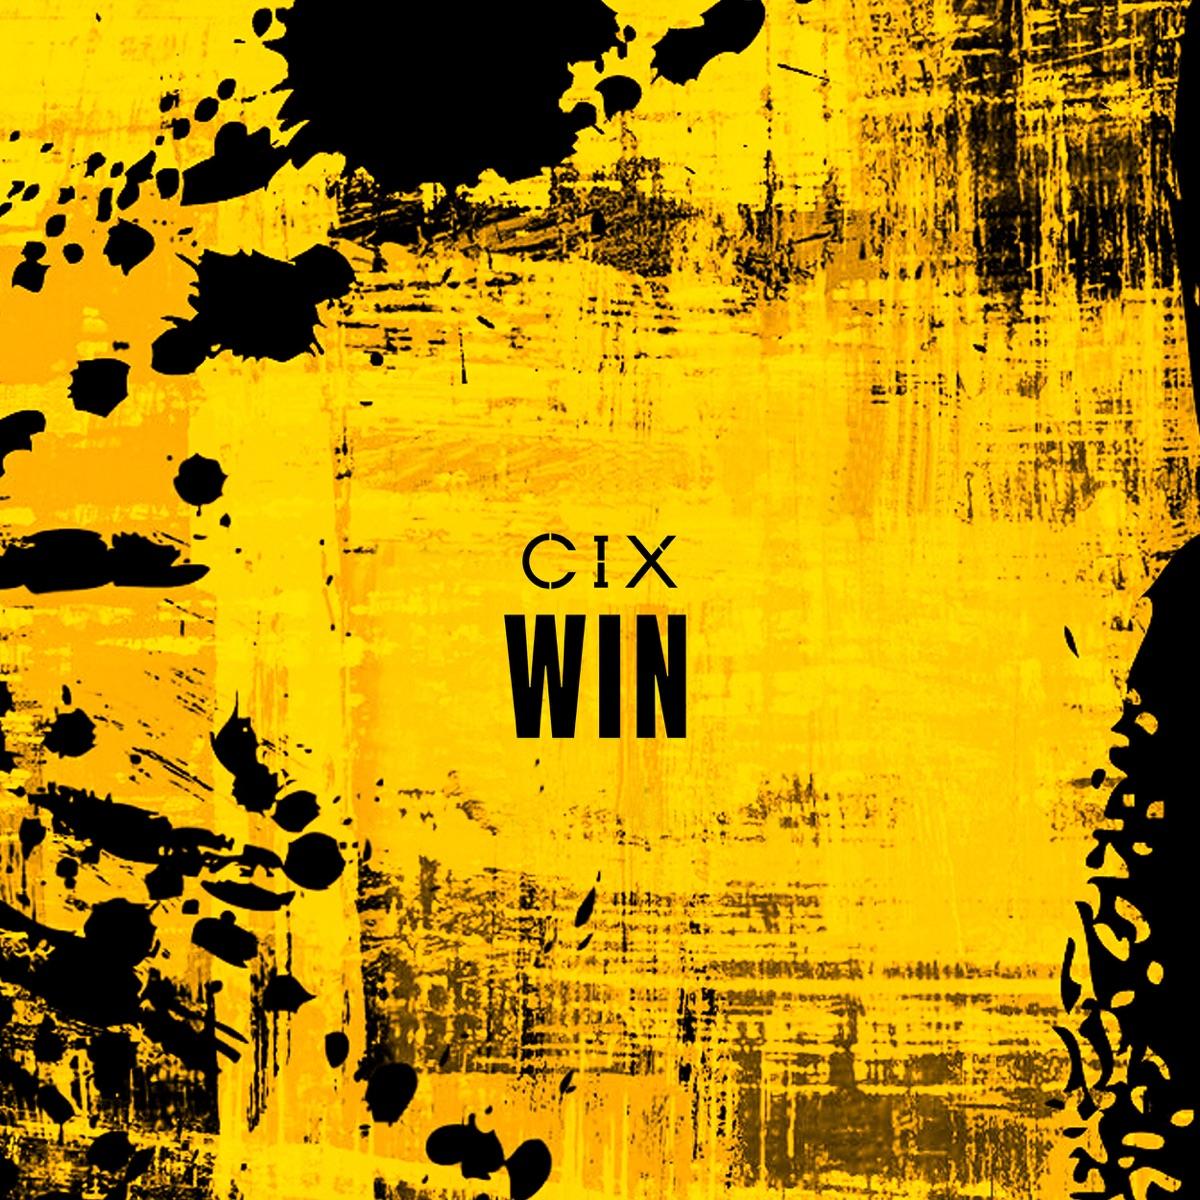 『CIX - WIN 歌詞』収録の『WIN』ジャケット